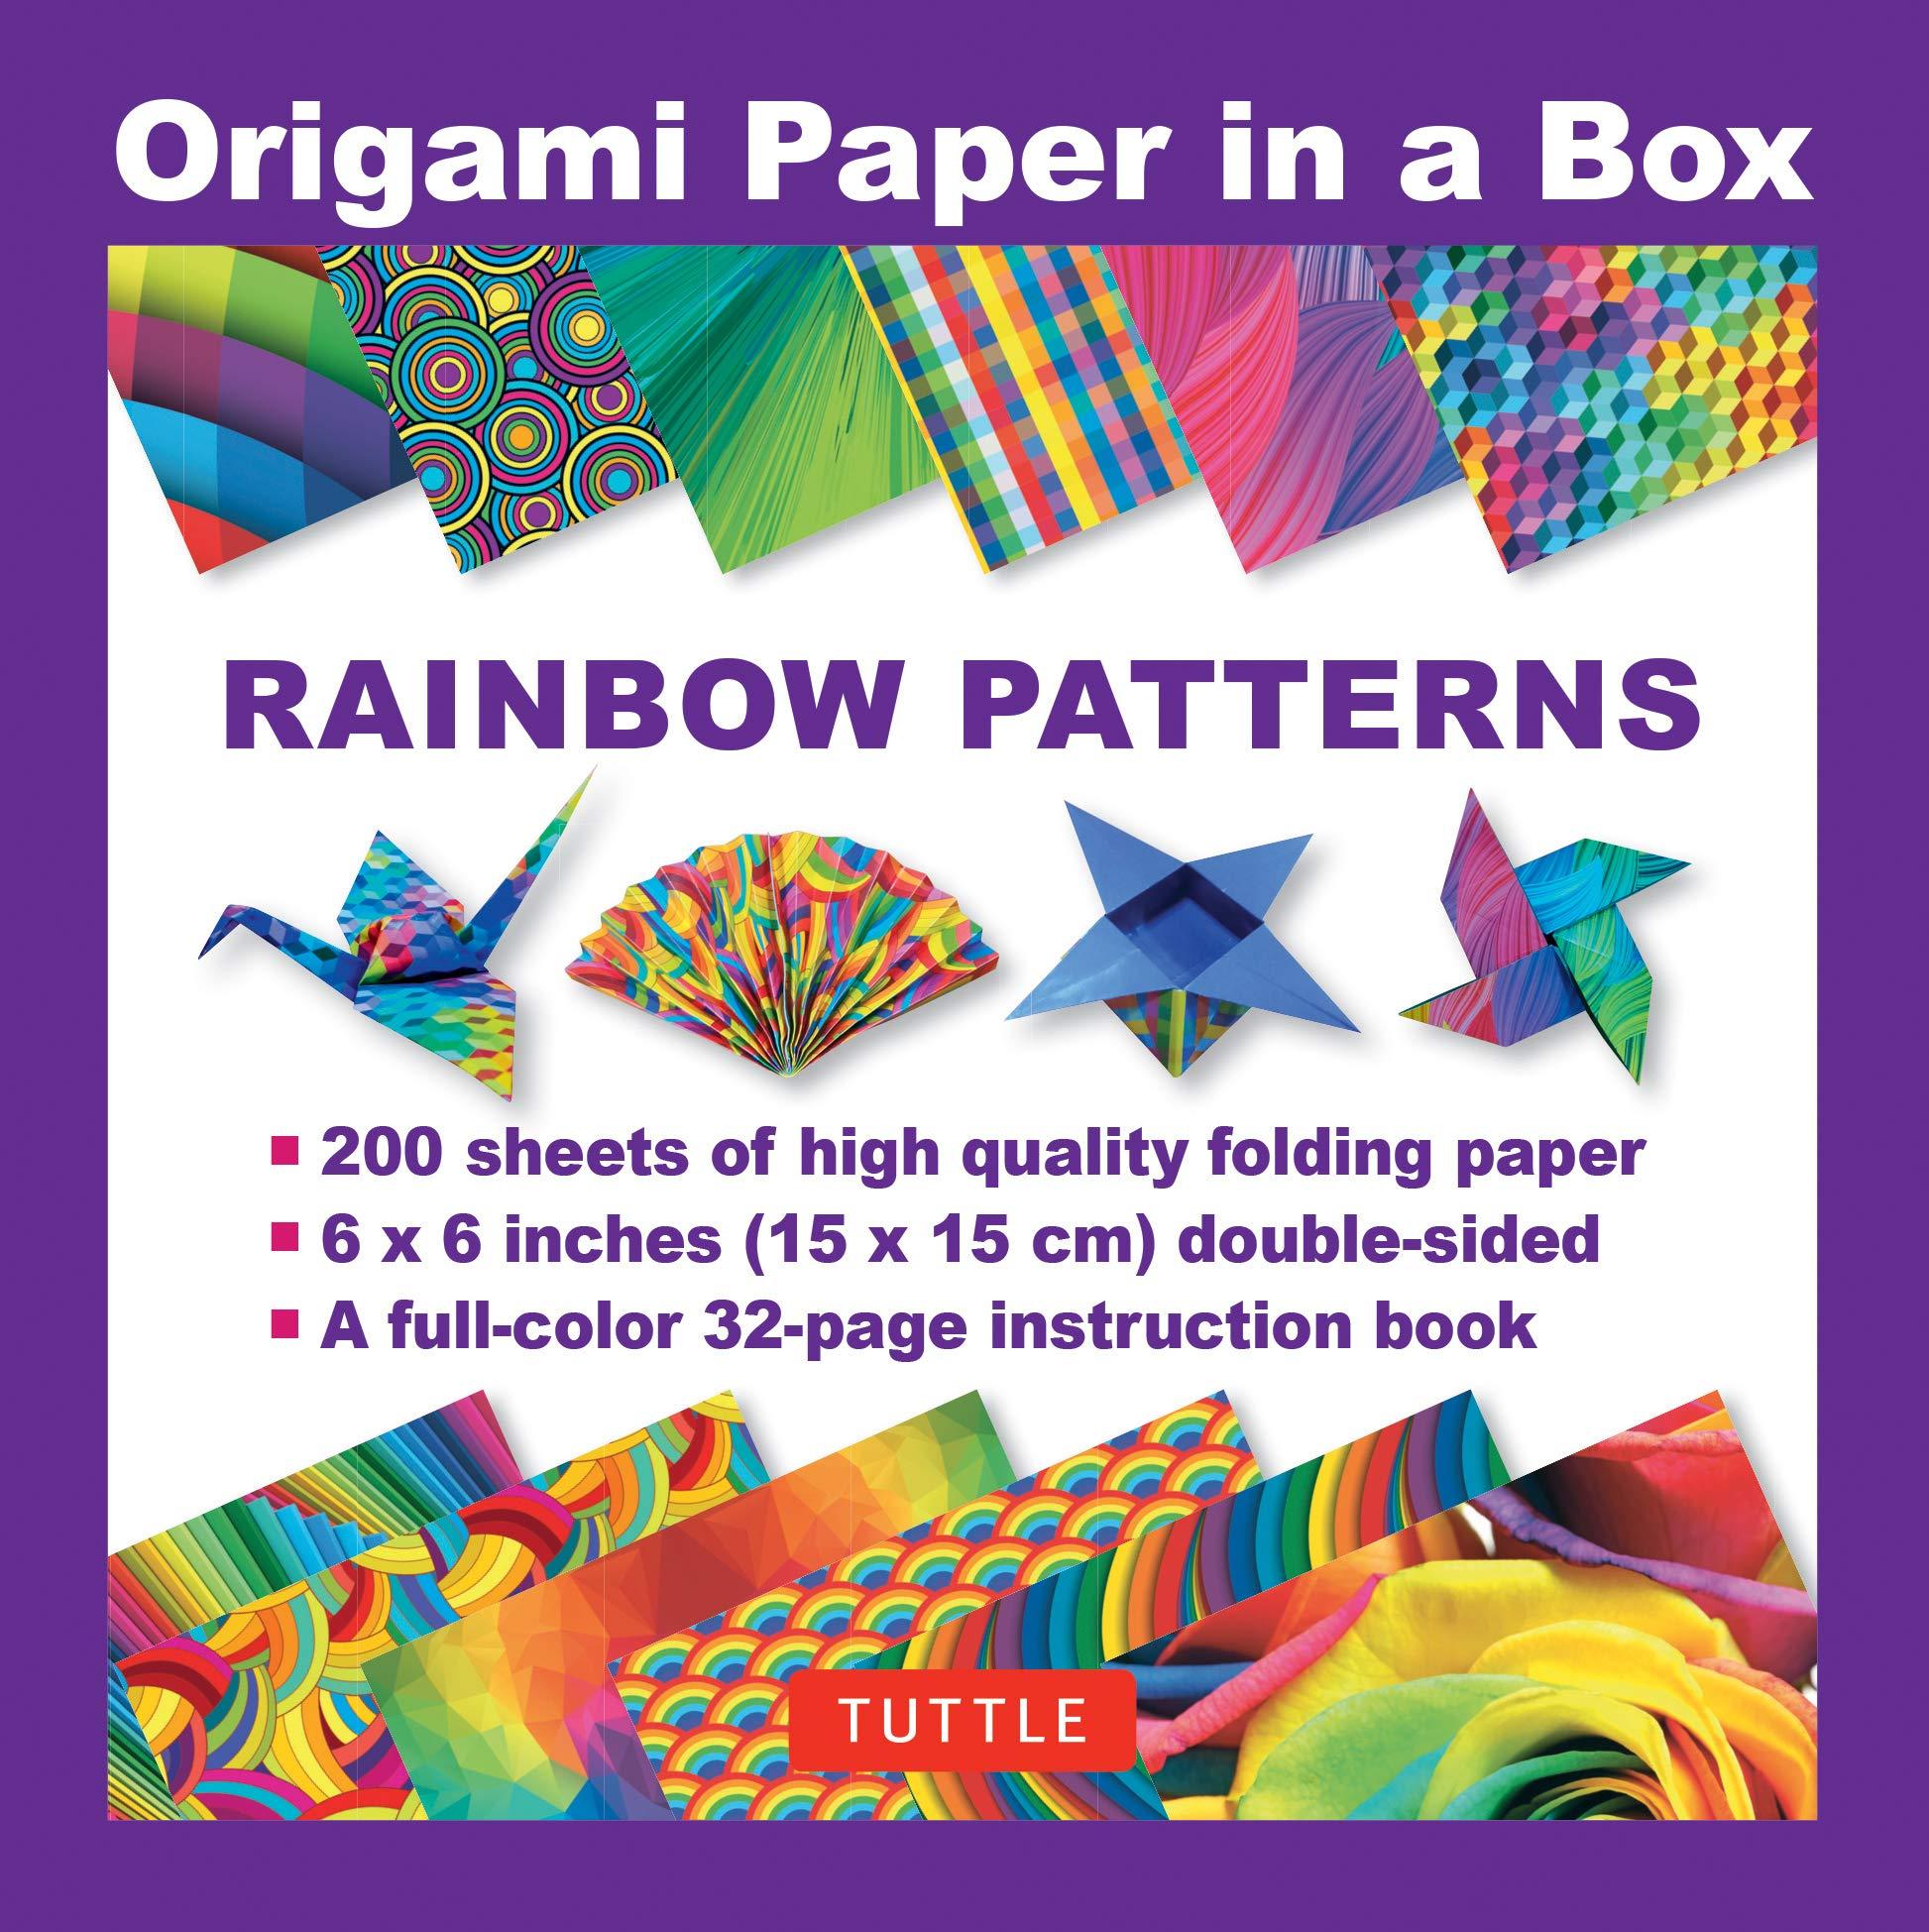 Contact us at Origami-Instructions.com | 1949x1946